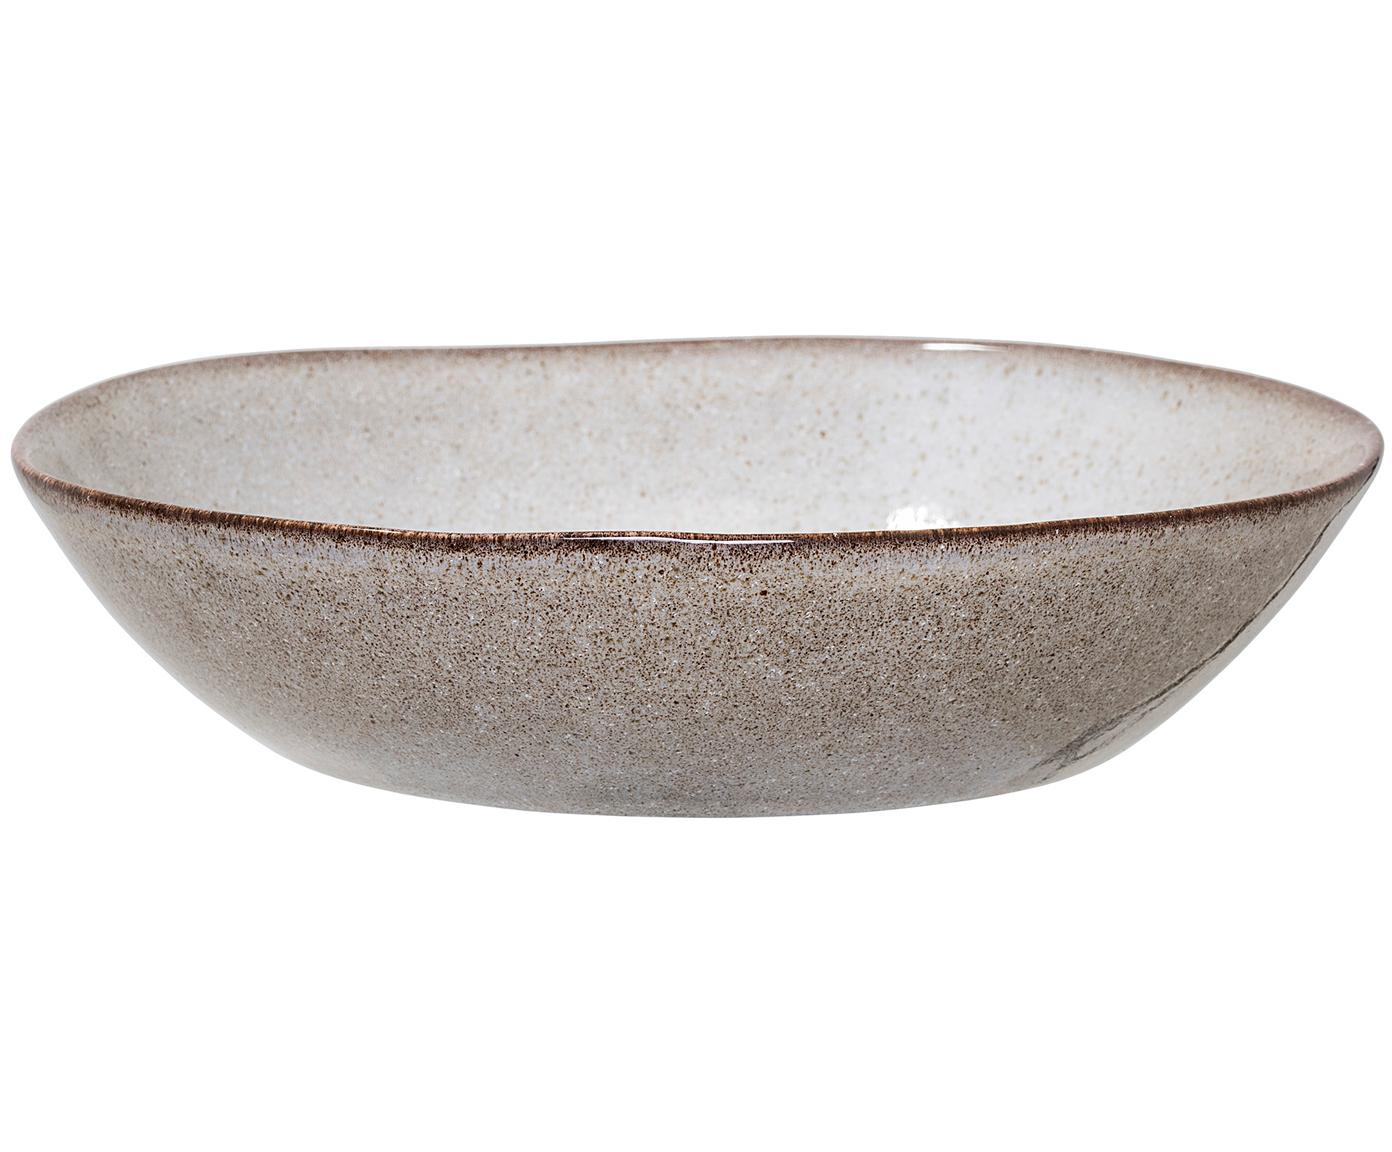 Ciotola fatta a mano Sandrine, Ceramica, Grigio chiaro, Ø 22 x Alt. 5 cm